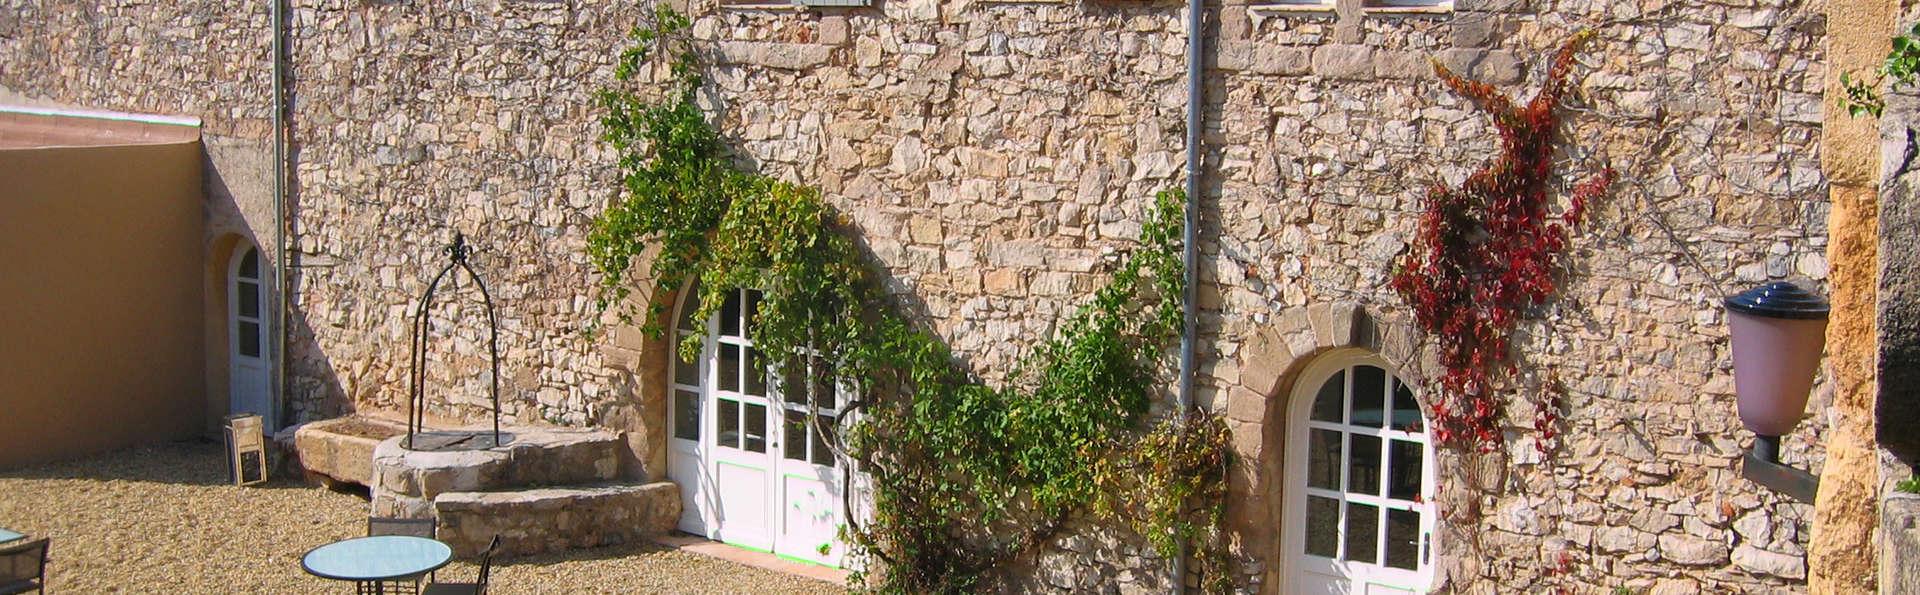 Mercure Aix-en-Provence Sainte-Victoire - edit_facade.jpg